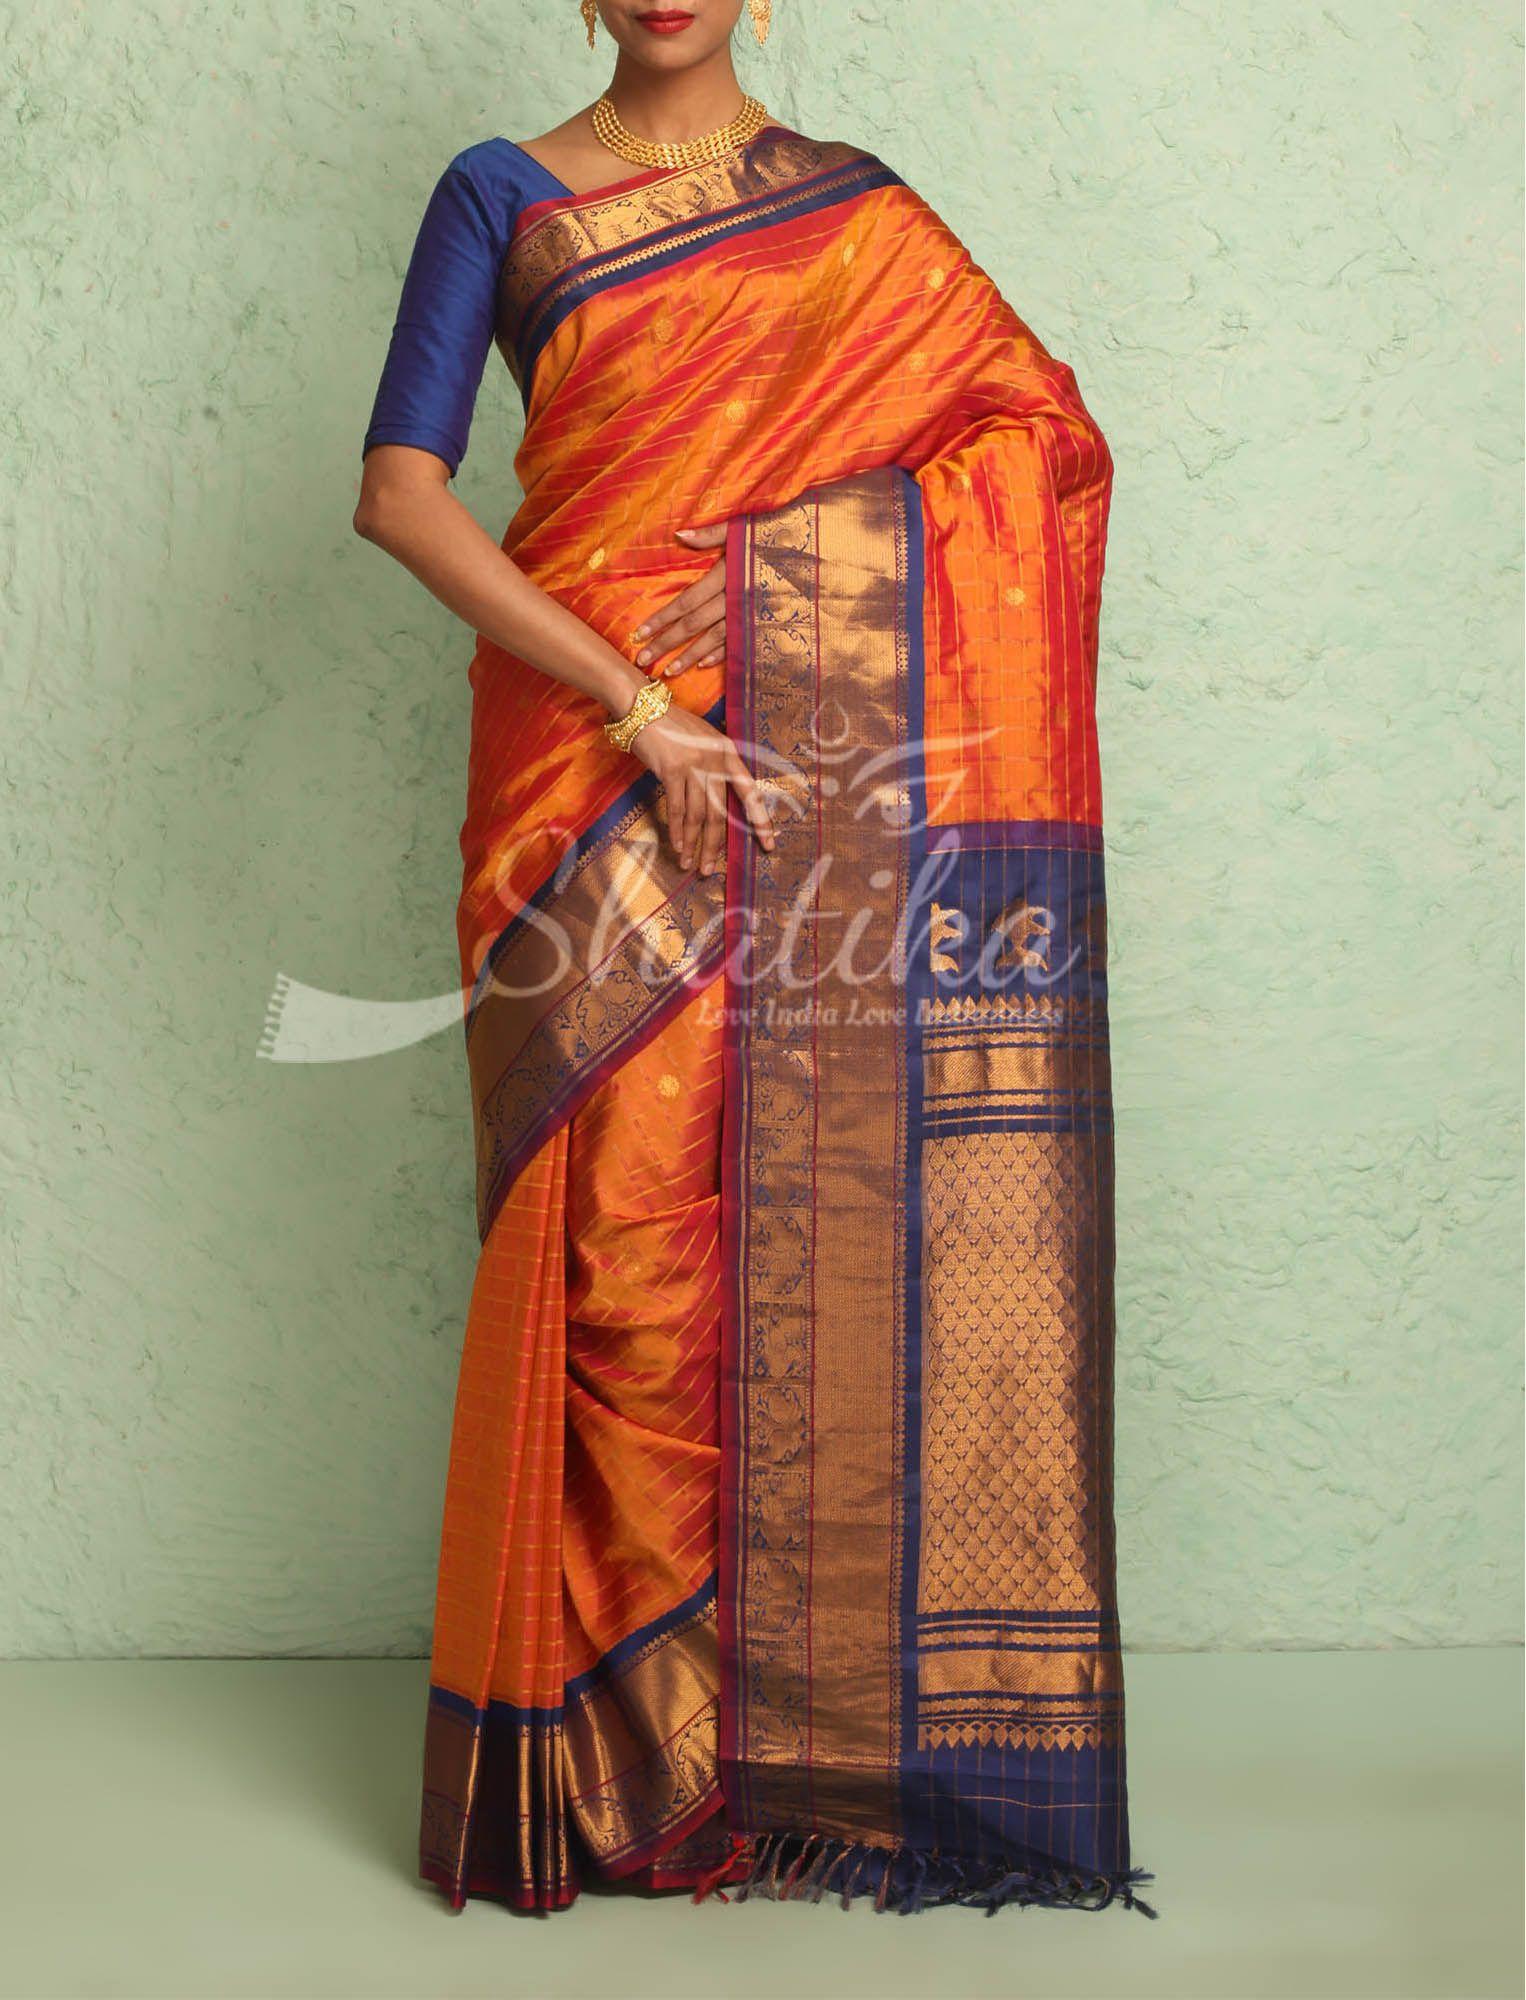 493de94833 Haripriya Rust Orange With Fine Checks Contrast Ornate Border Pallu Pure  Gadwal Silk Saree